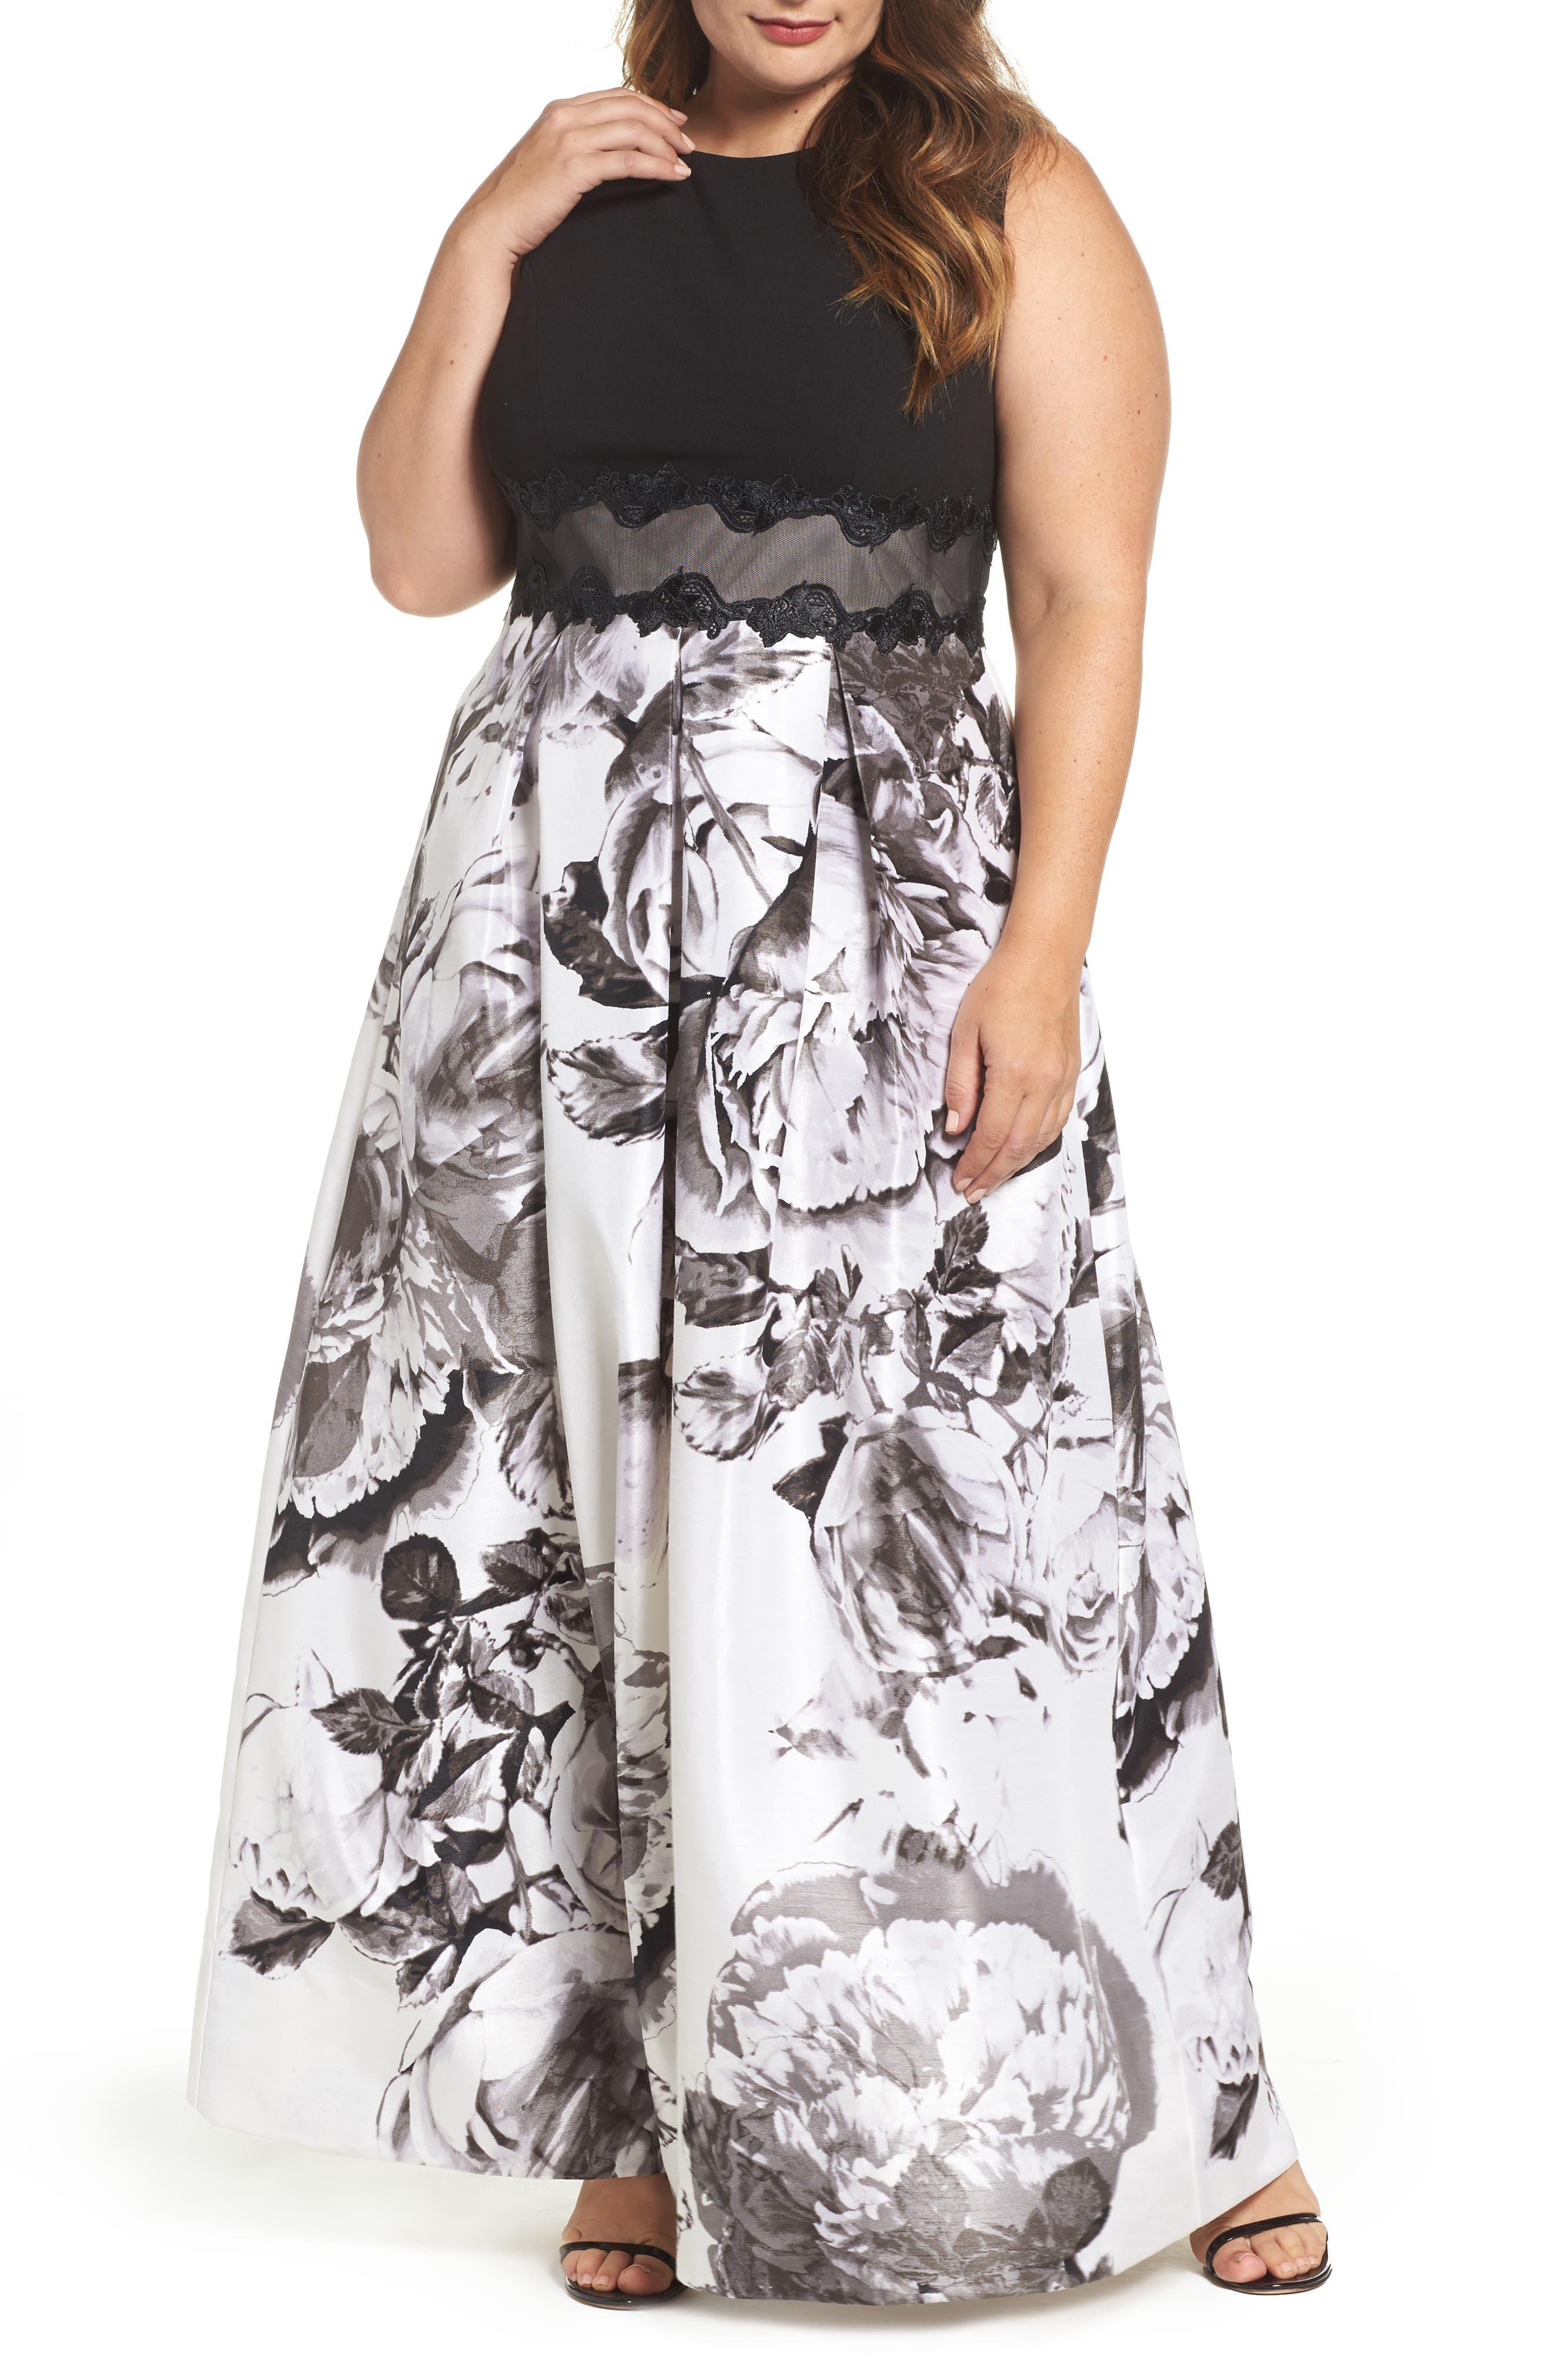 Alternate Image 1 Selected - Sangria Floral Print Ballgown (Plus Size)